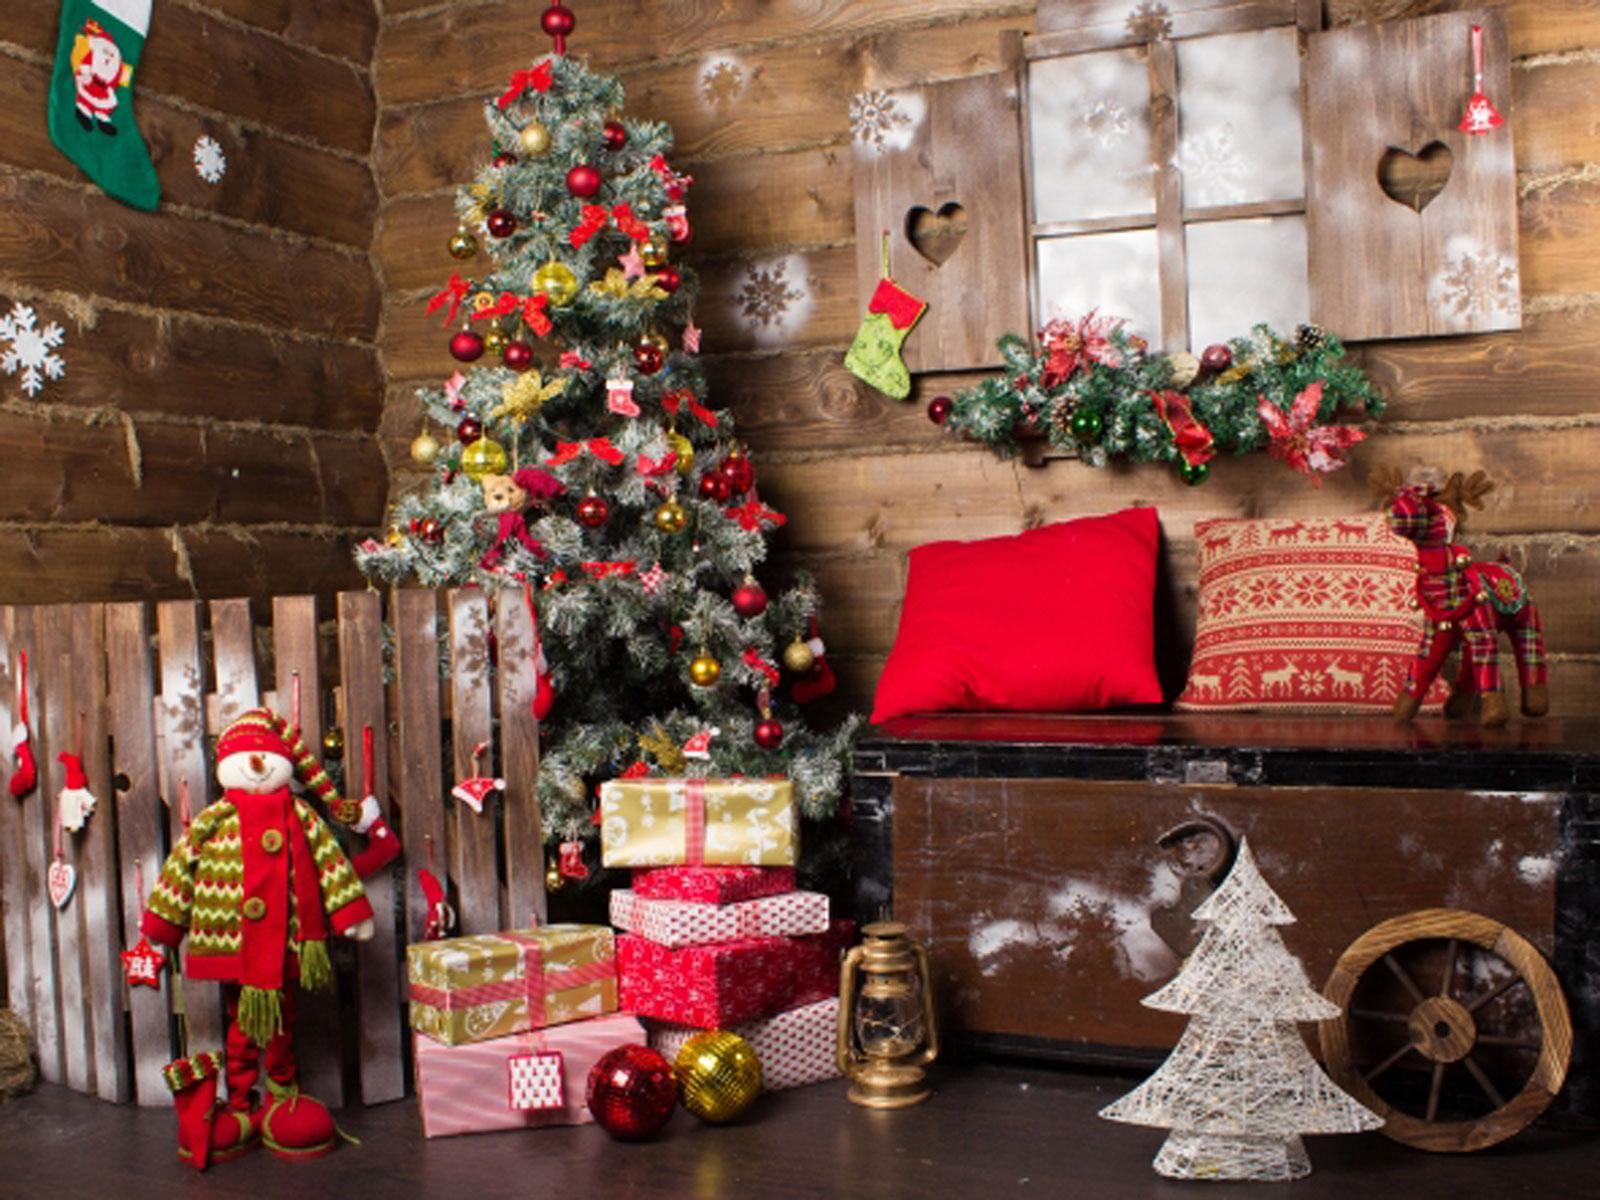 Merry Christmas Photography Backdrop Family Photo Shoot